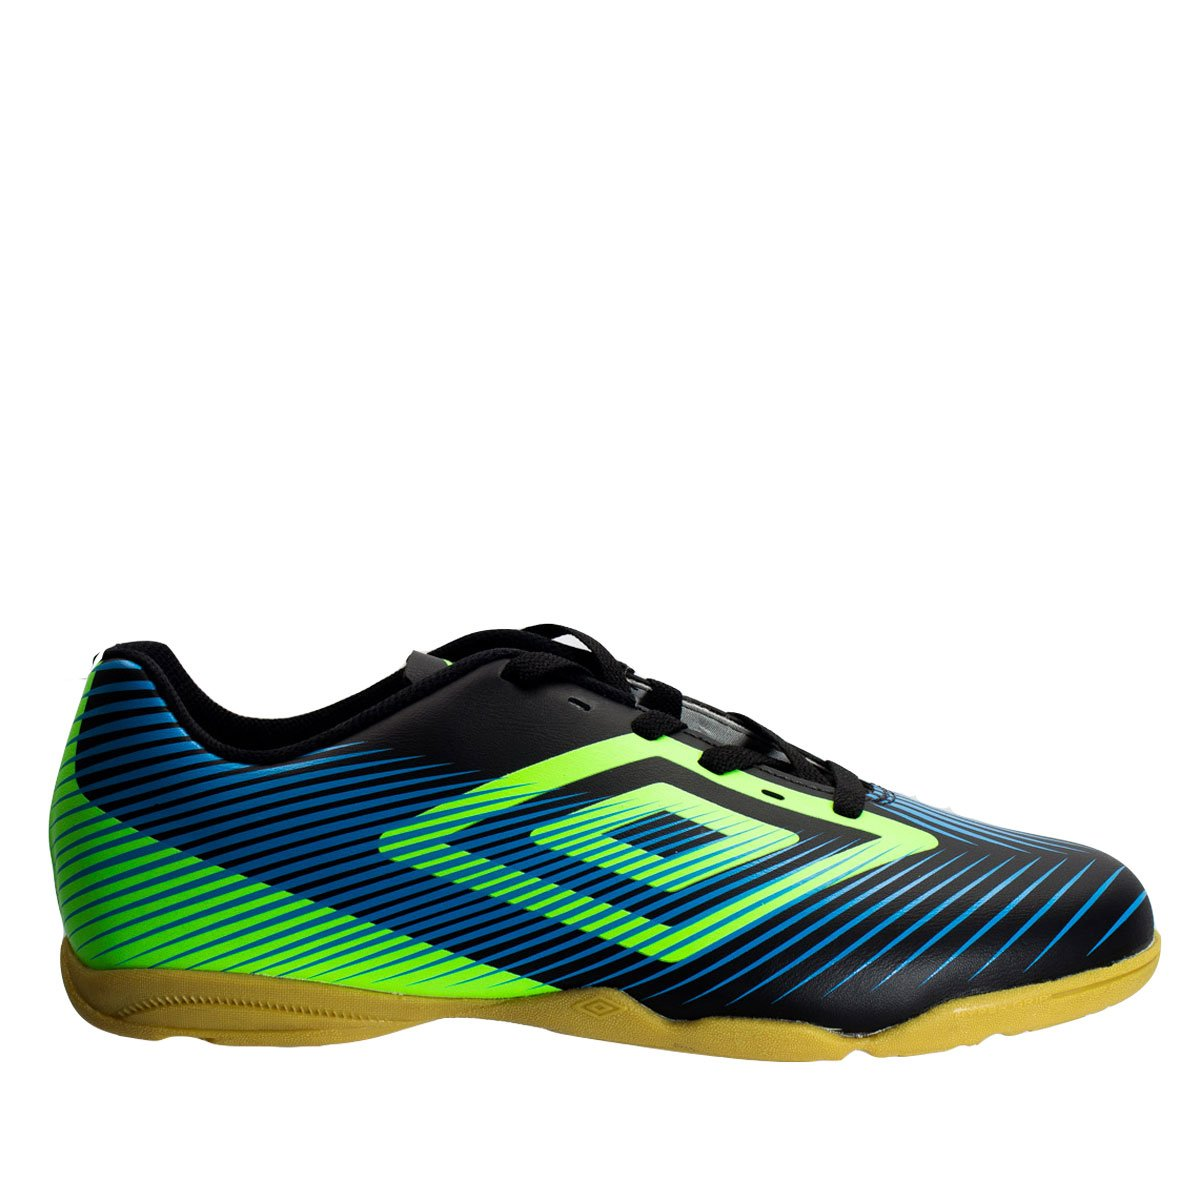 ecdf6366d159b Imagem - Chuteira Futsal Umbro Indoor Speed II 0f72049 - 055288